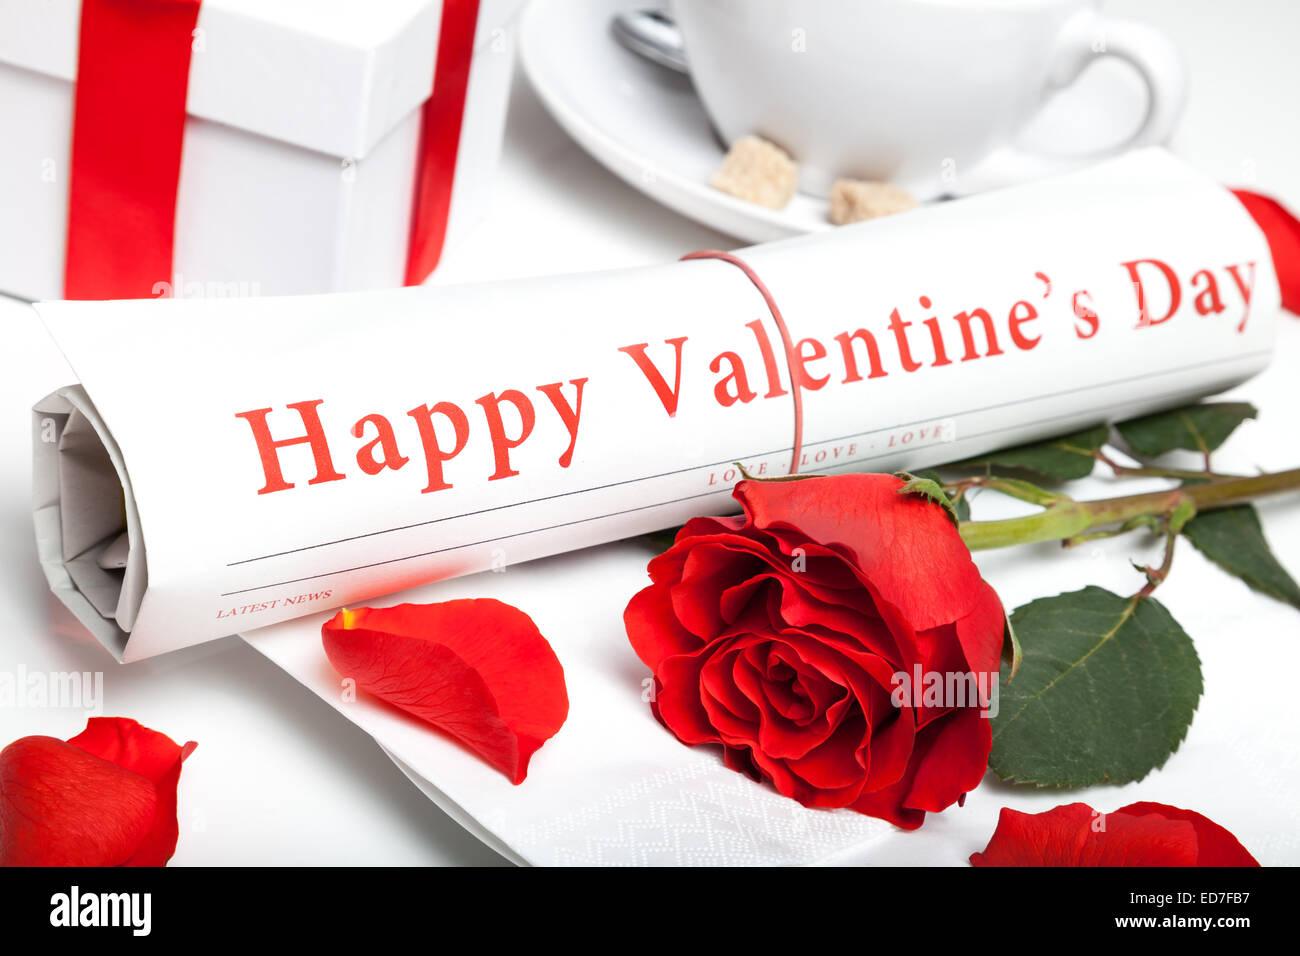 'Happy Valentine's day' Journal, rose rouge et d'aujourd'hui fort Banque D'Images